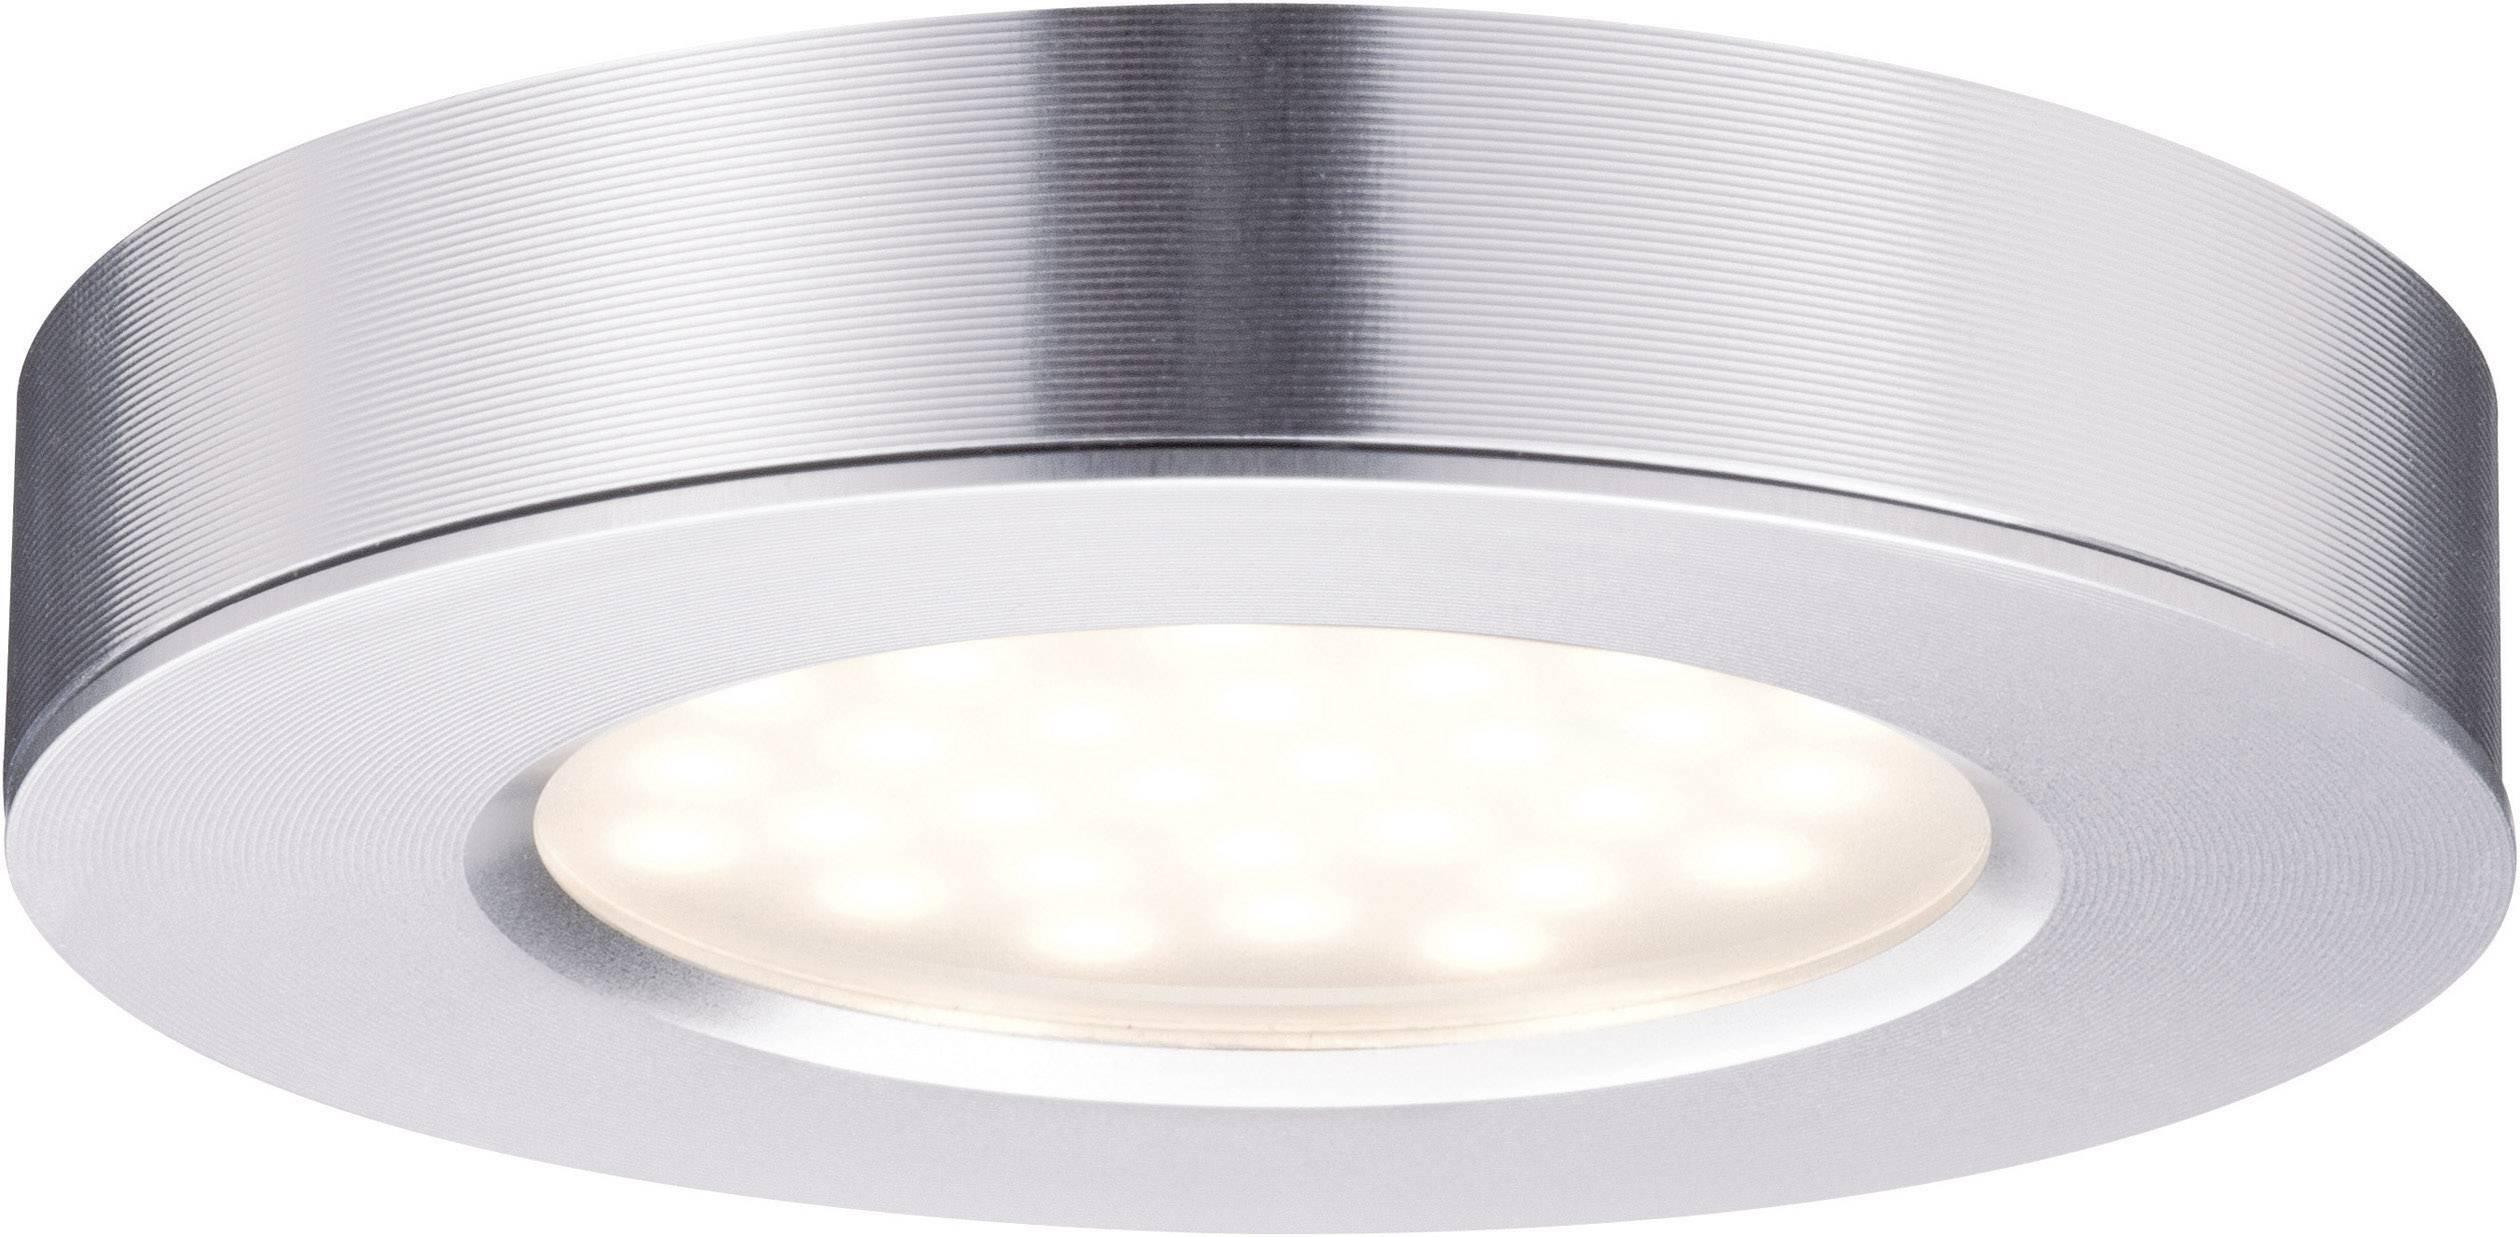 LED osvětlení na stěnu/strop Paulmann Micro Line Platy 9 W teplá bílá sada 3 ks hliník